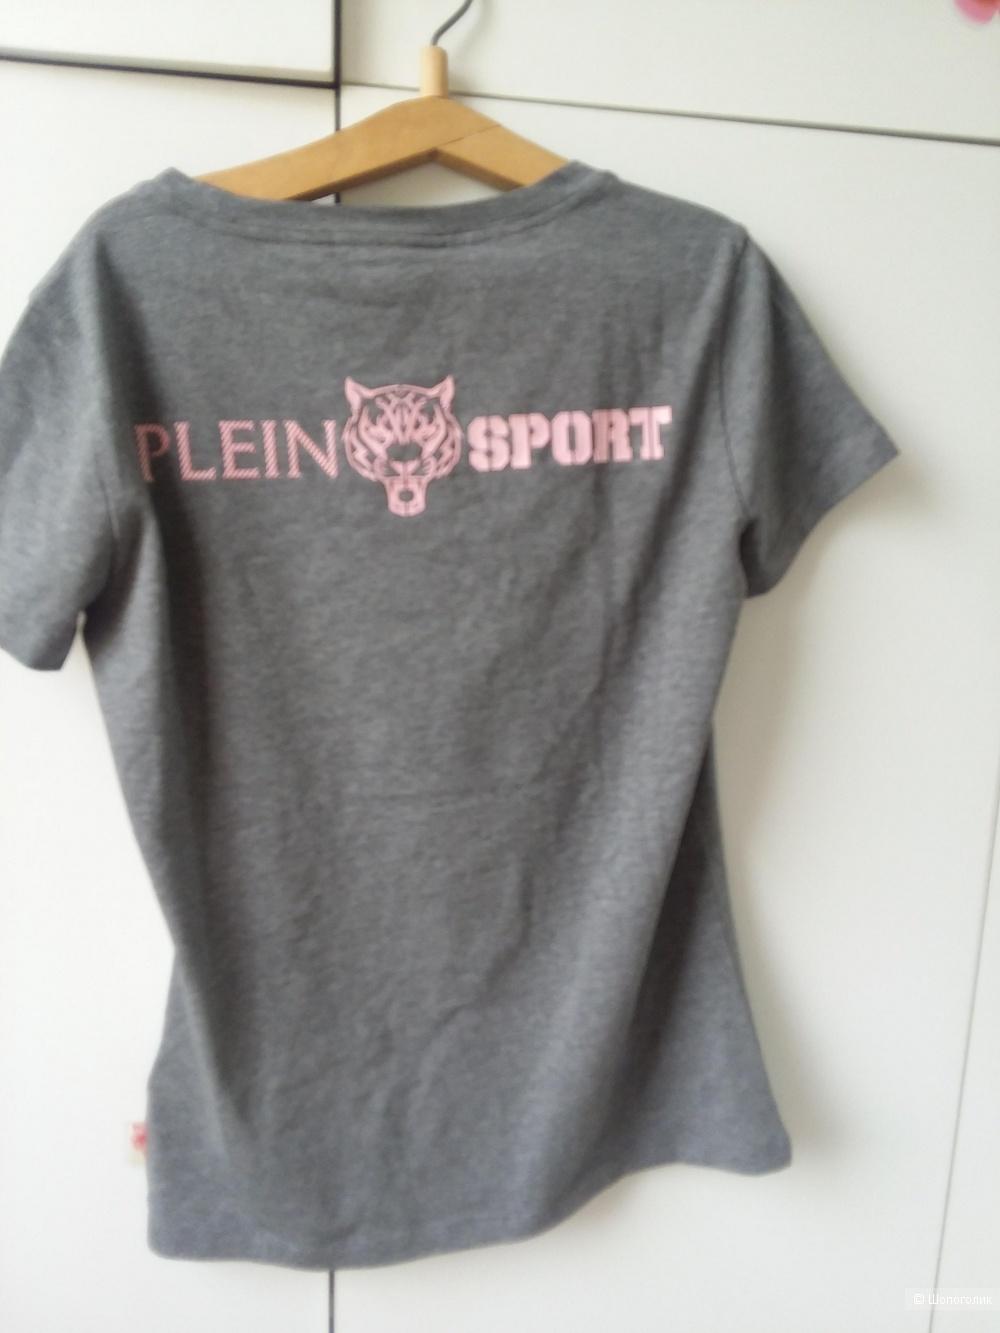 Женская футболка Plein Sport на 44-46 размер